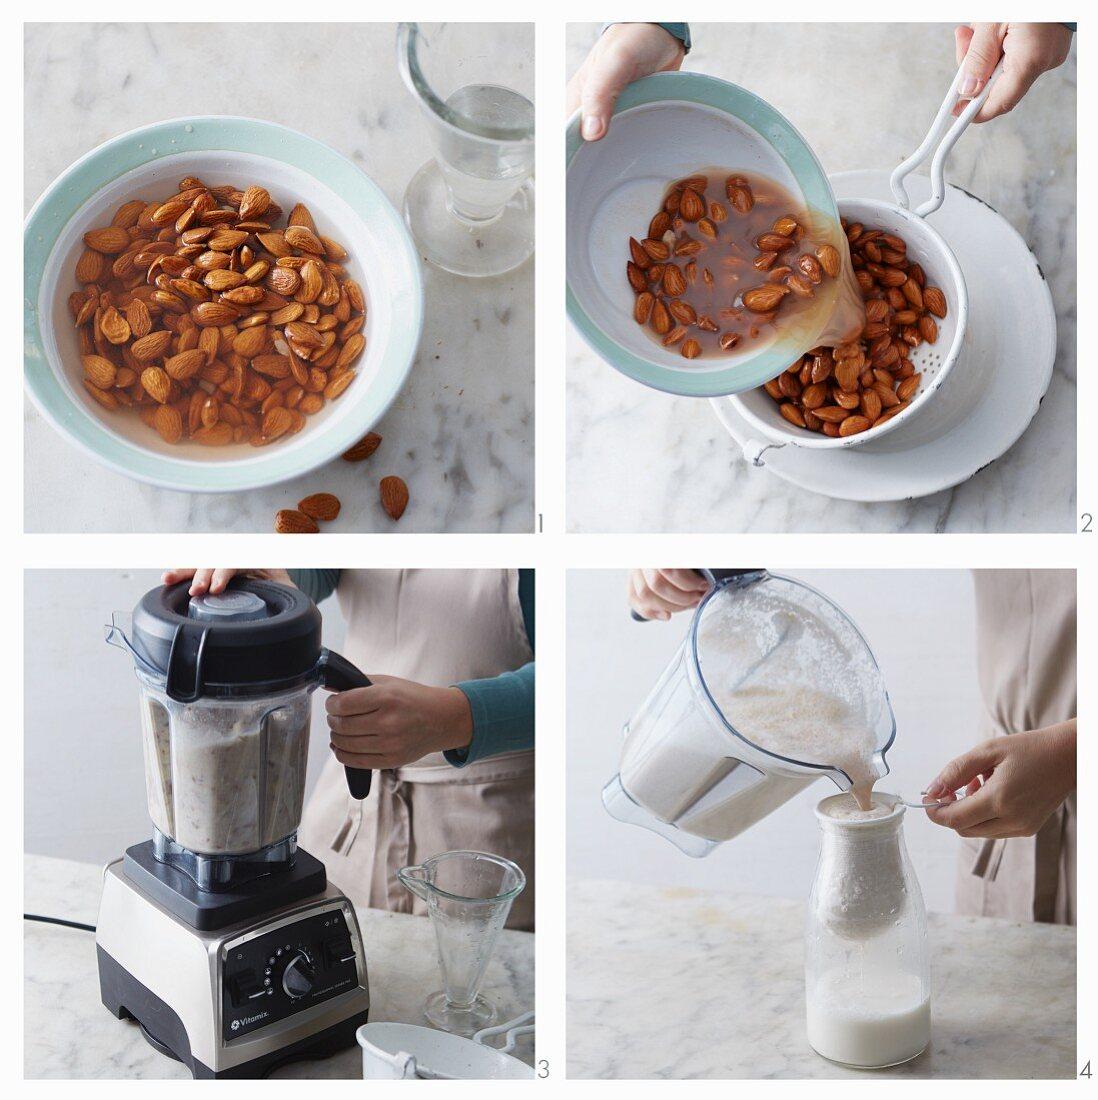 Vegan almond milk with dates being made